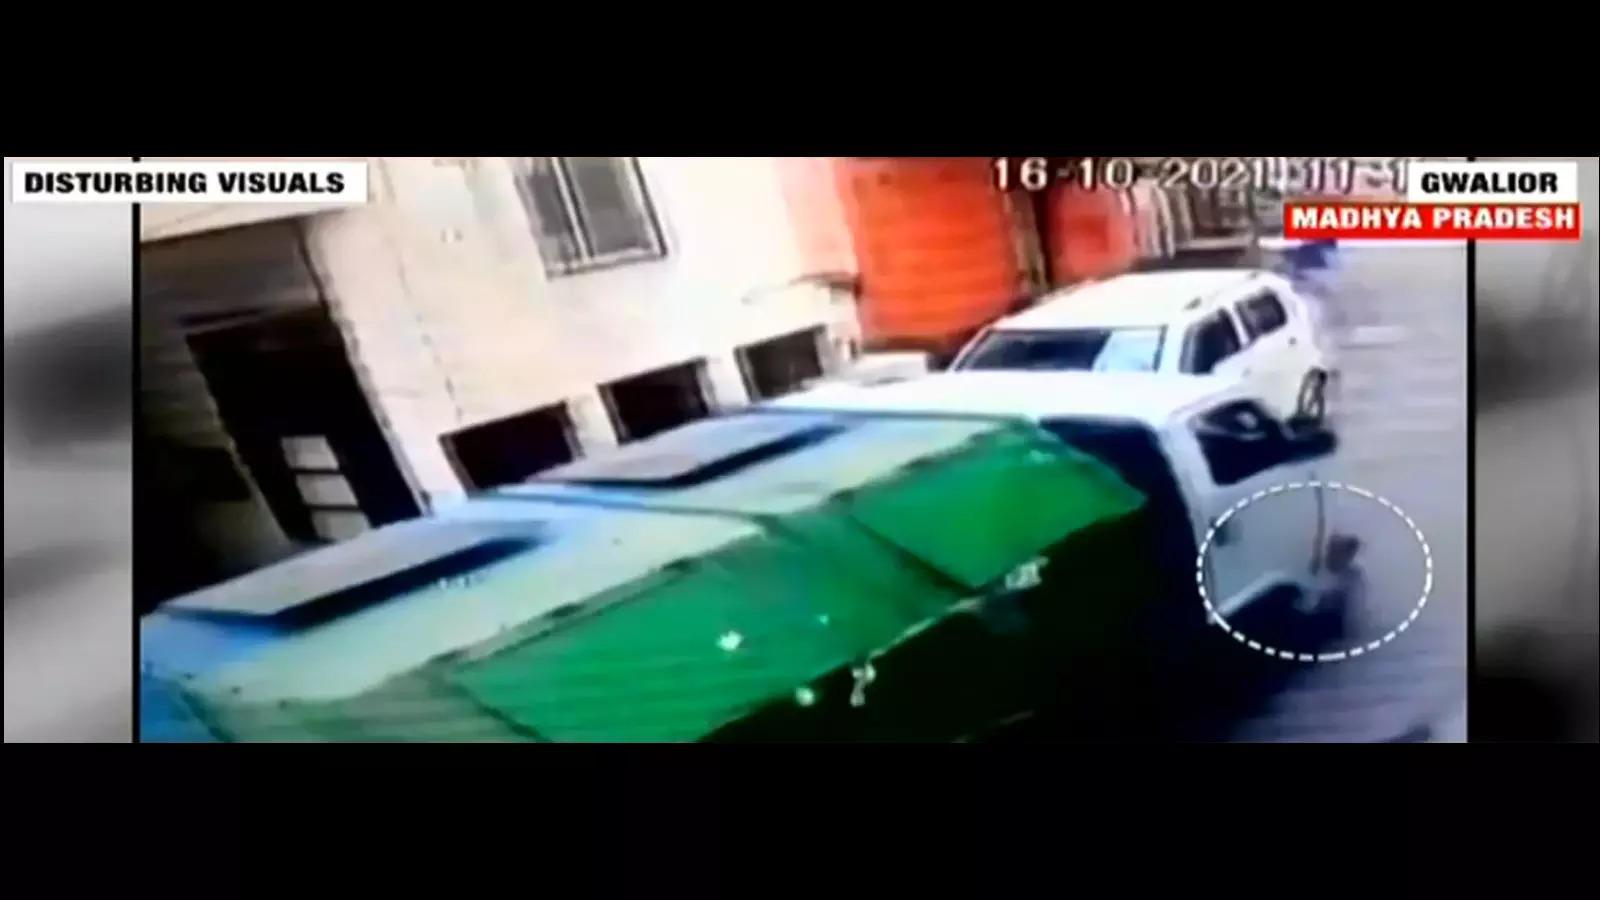 tragic-municipal-garbage-vehicle-crushes-toddler-to-death-in-gwalior